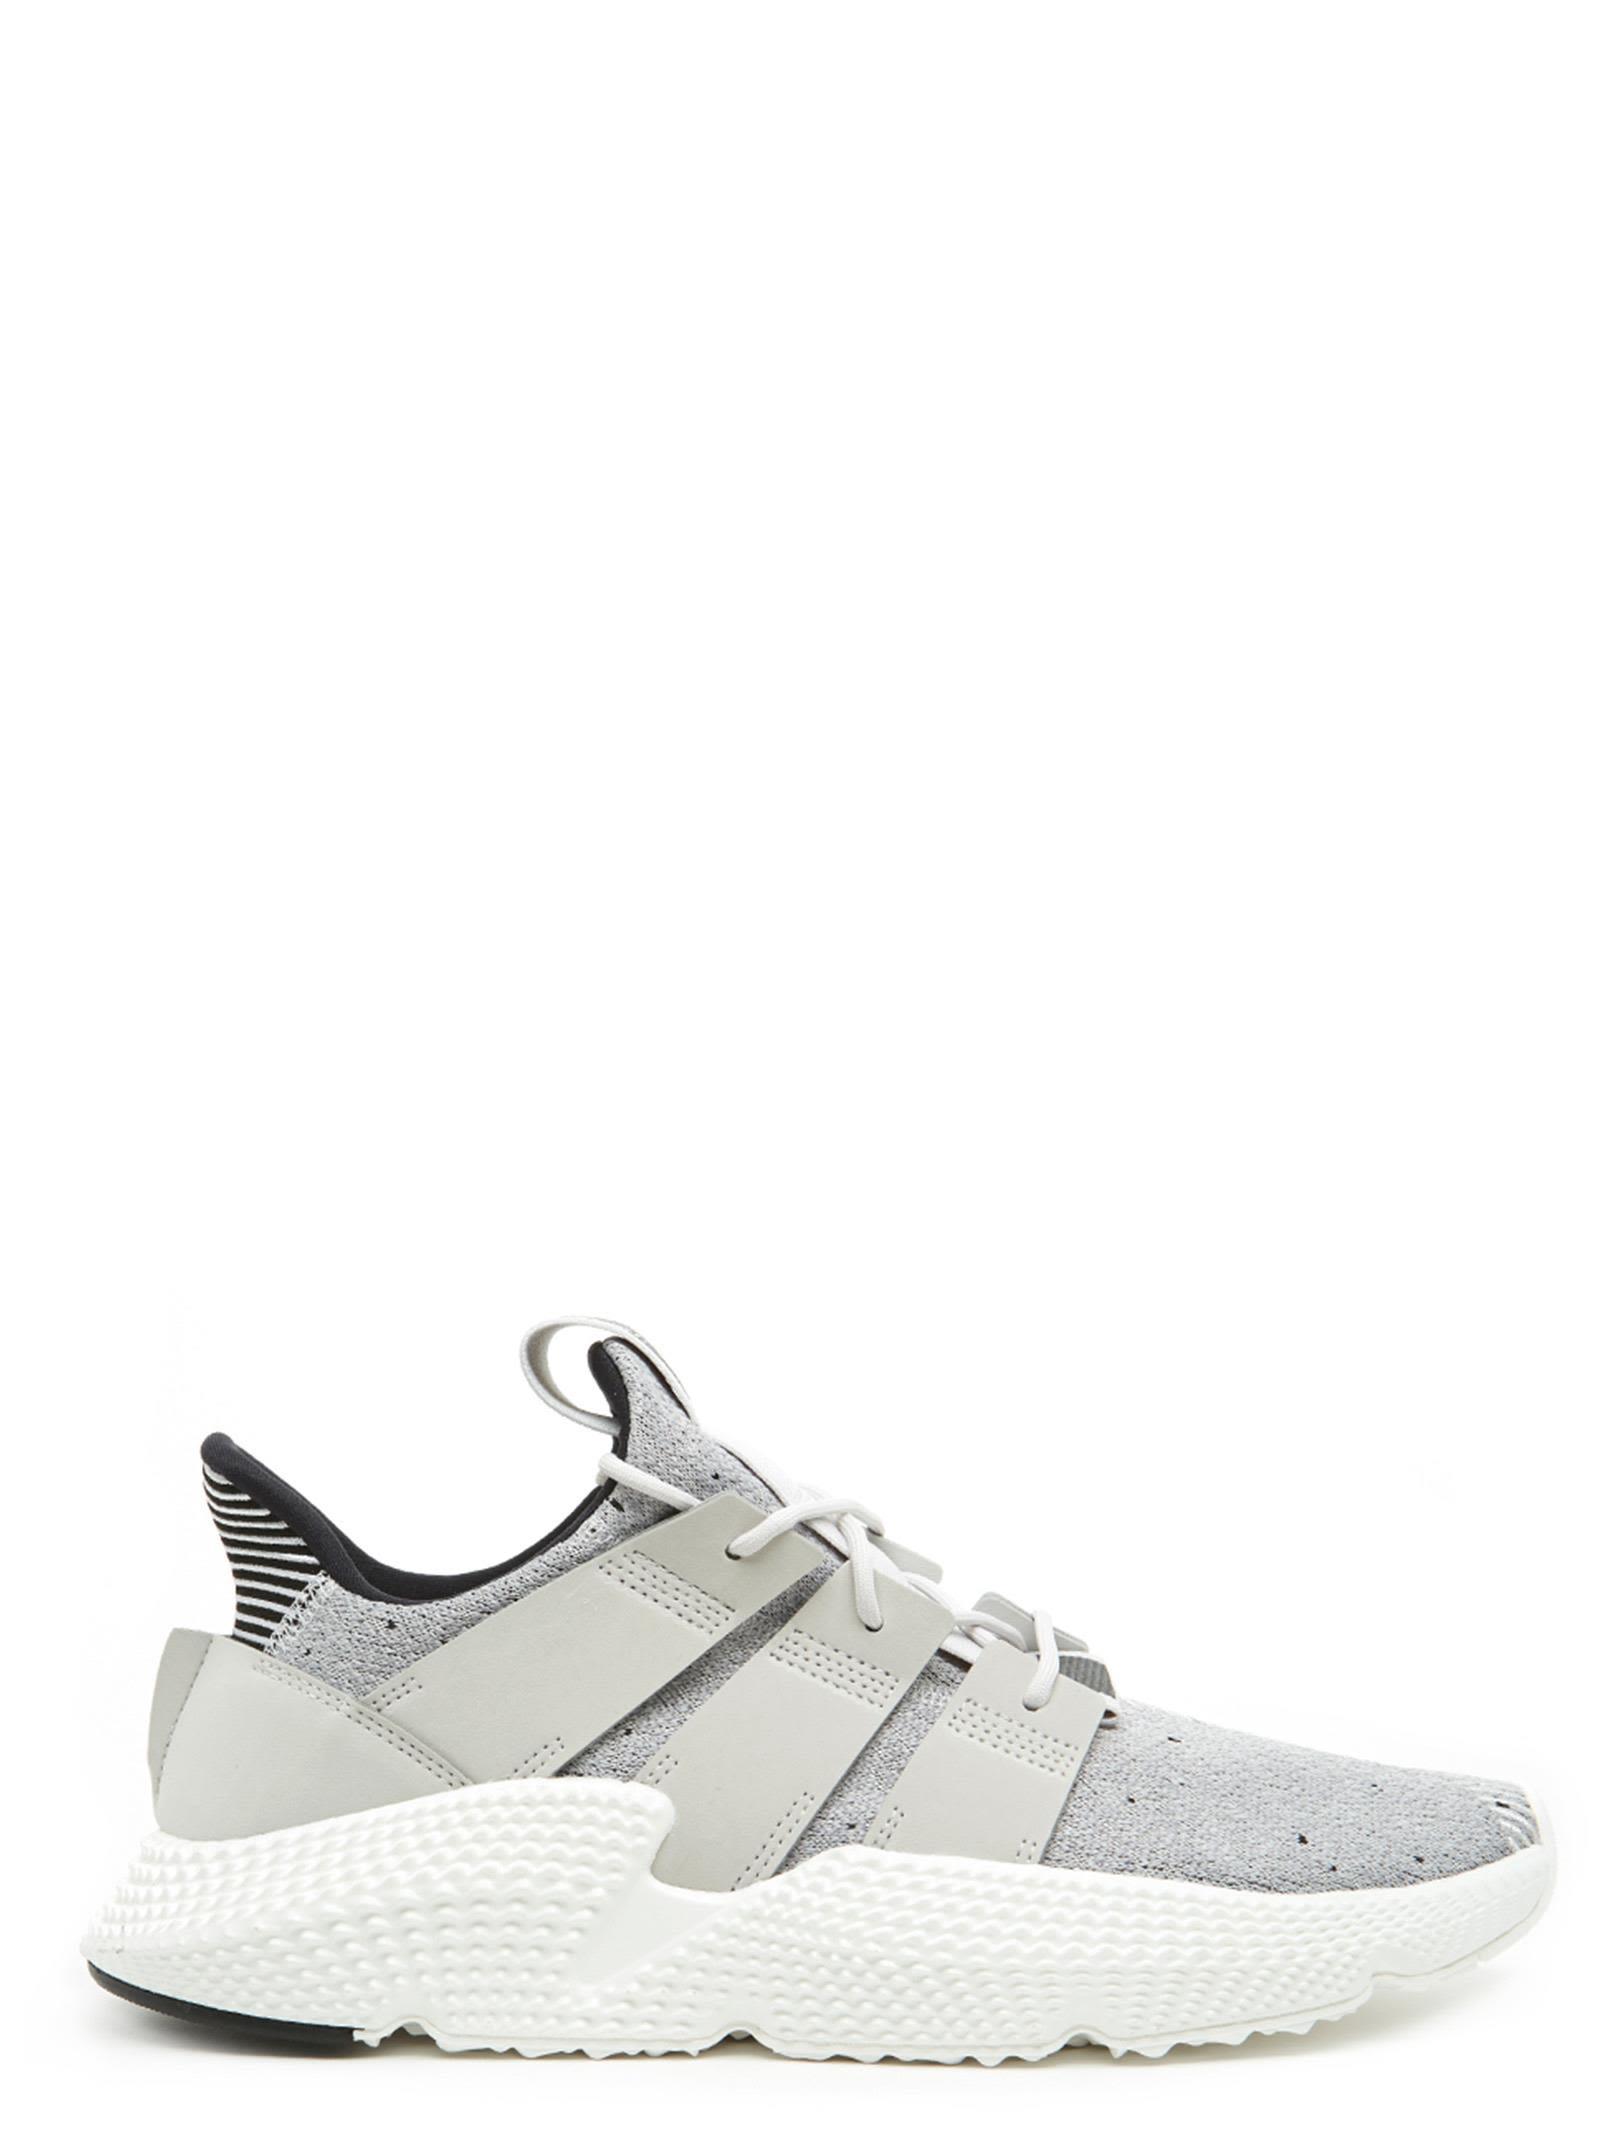 Adidas Originals 'prophere' Shoes